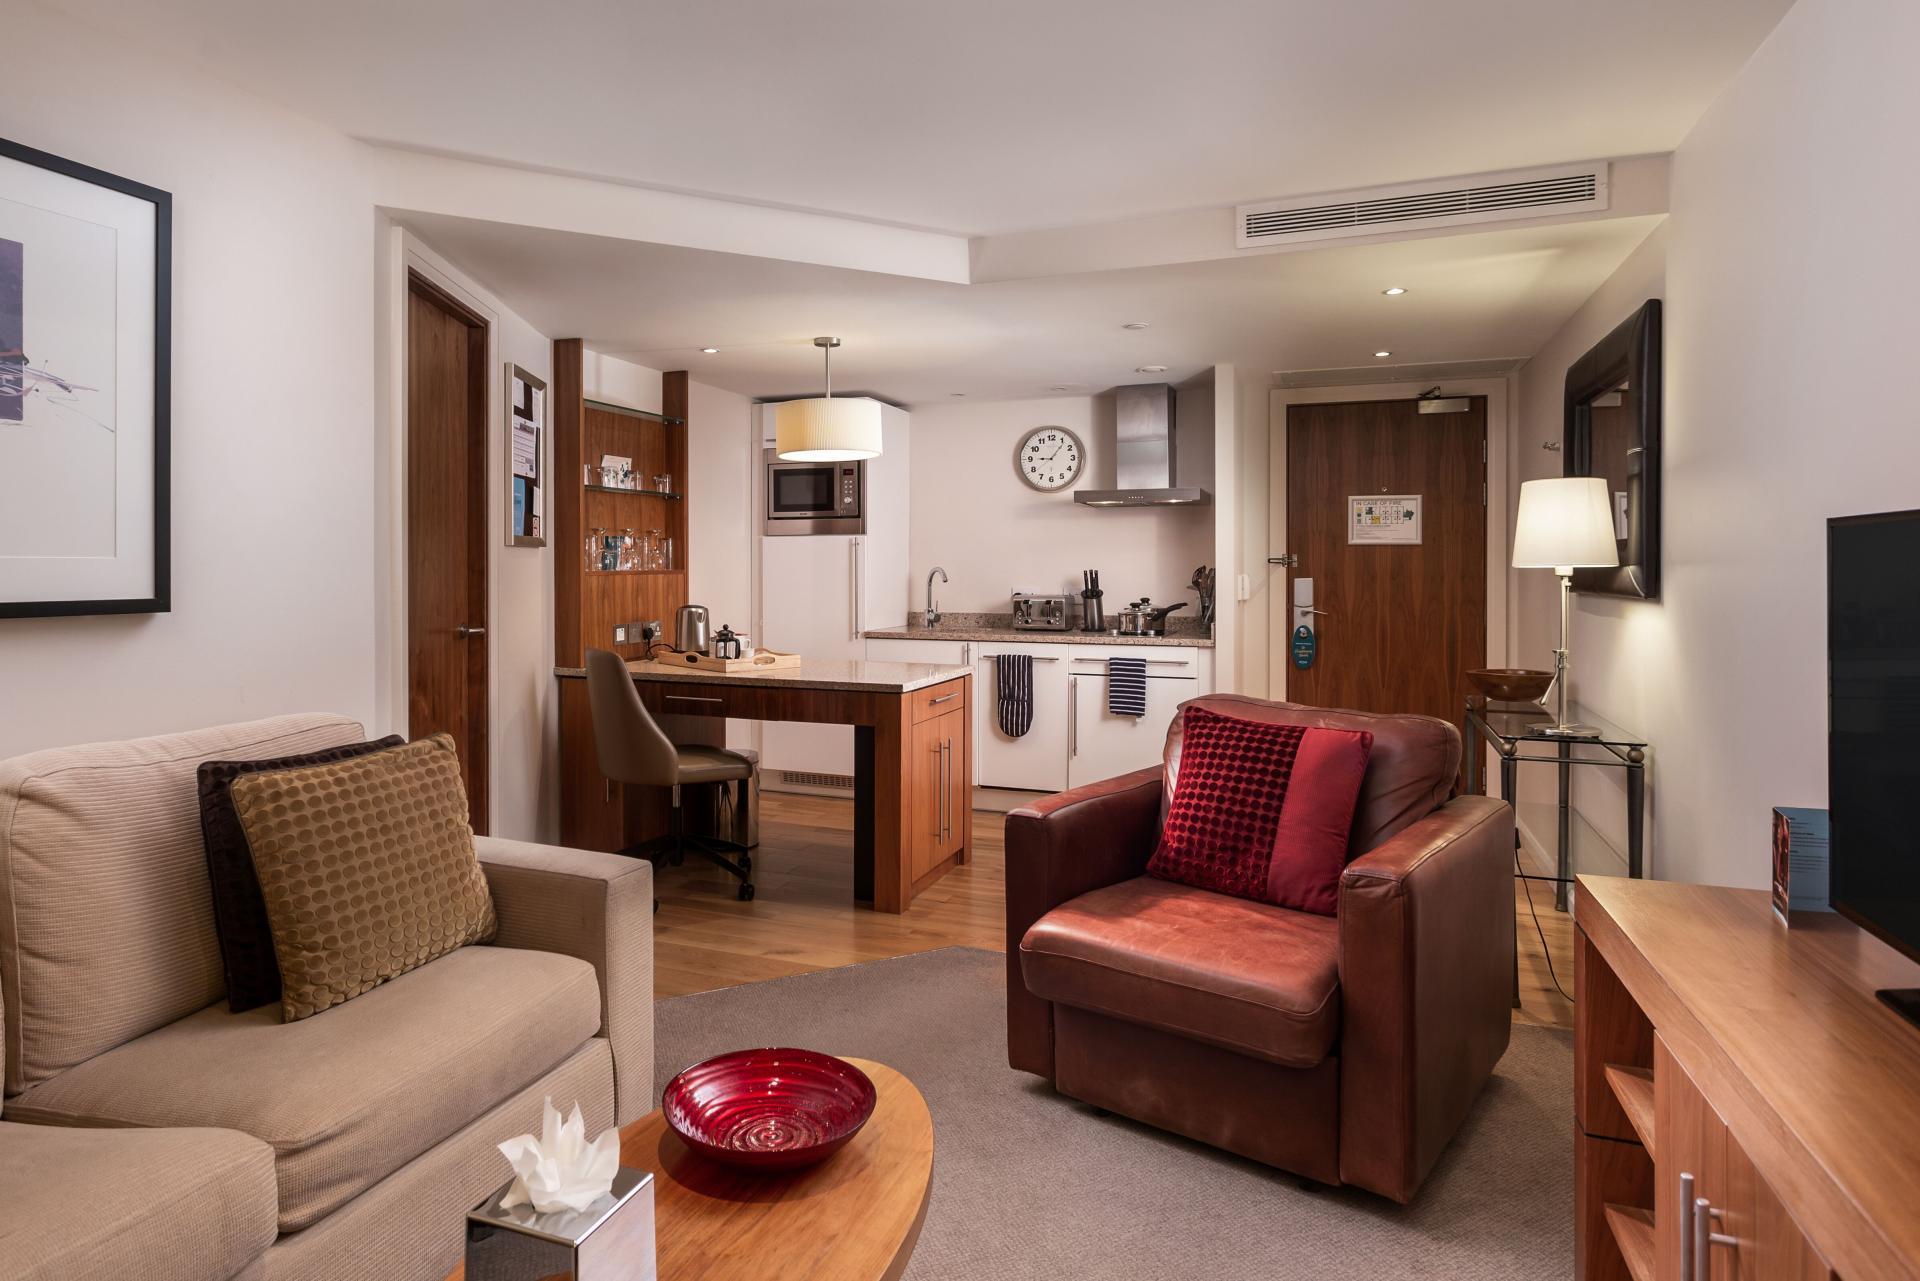 Living area at Newcastle Staybridge Suites Newcastle - Citybase Apartments